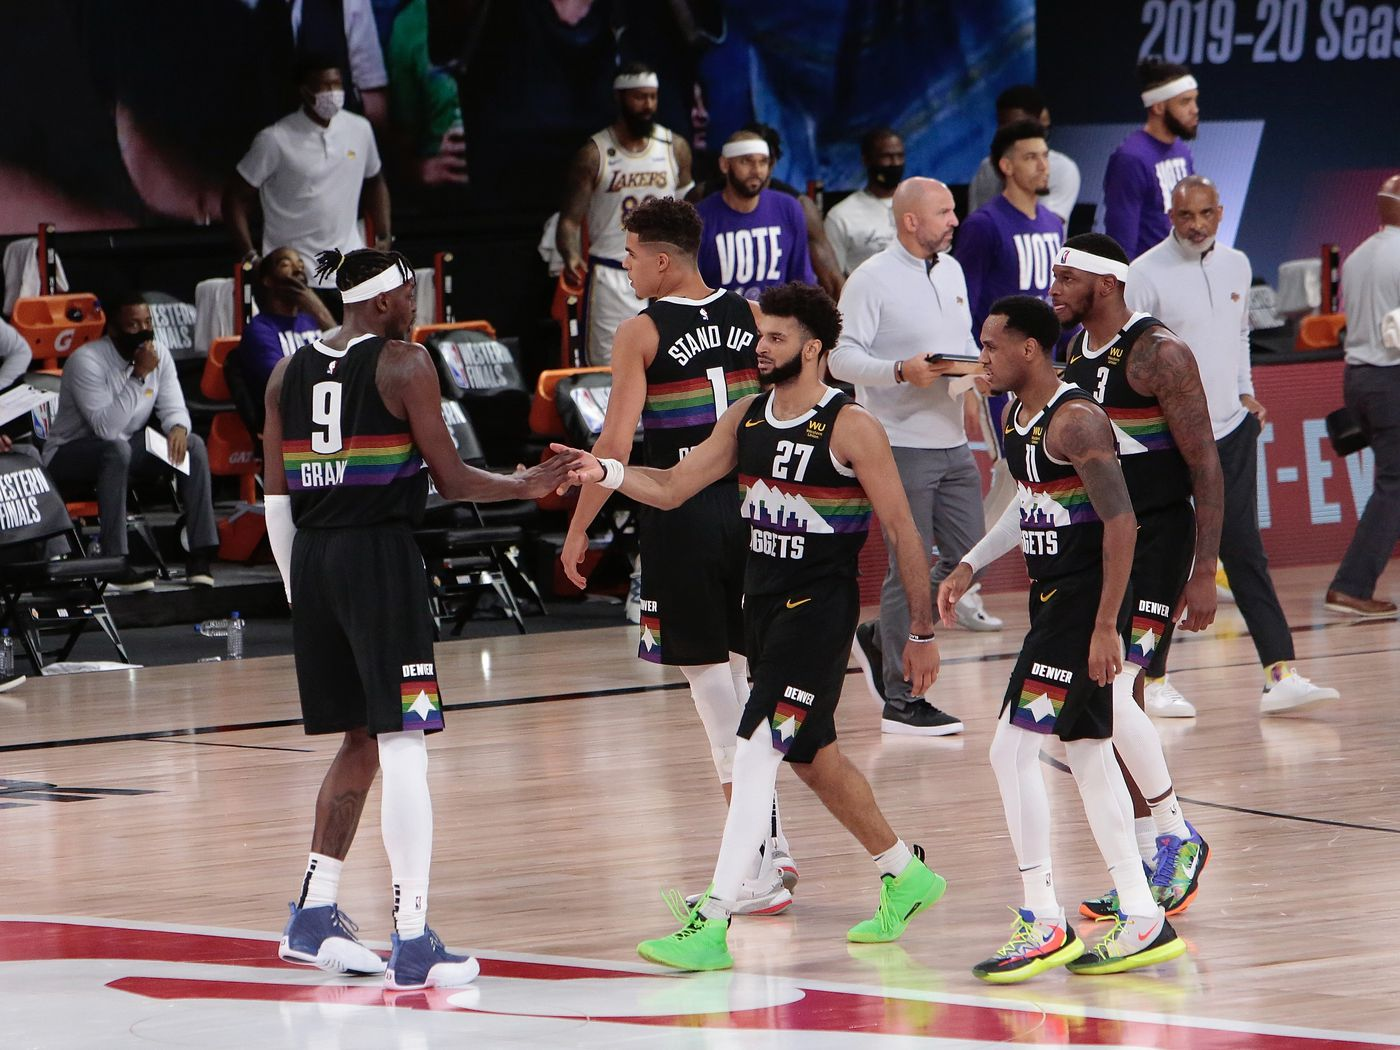 Los Angeles Lakers Vs Washington Wizards Live Stream Reddit